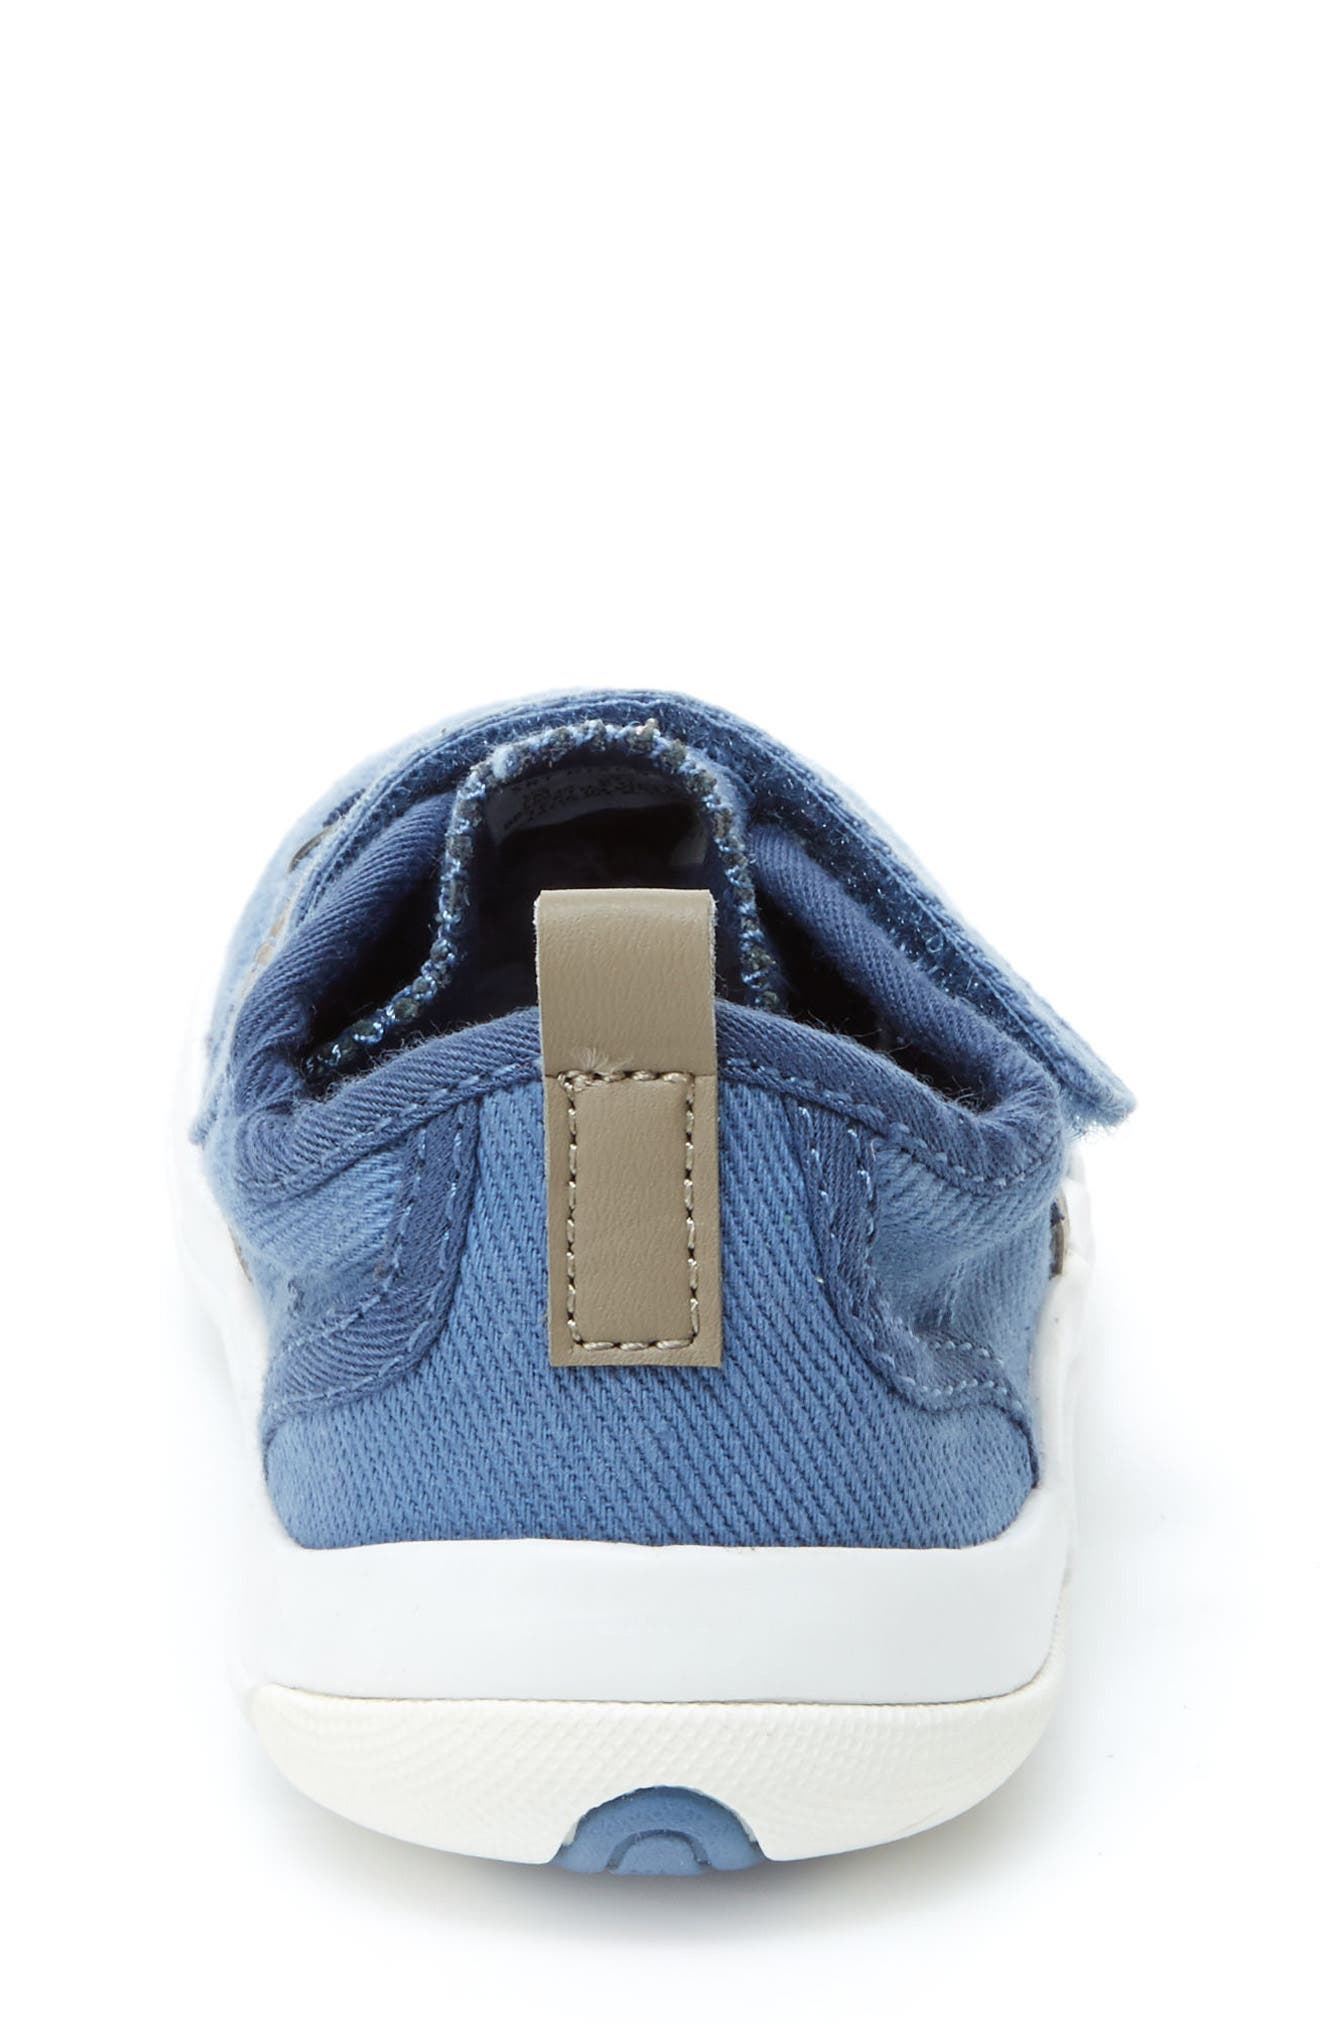 Dixon Sneaker,                             Alternate thumbnail 2, color,                             400